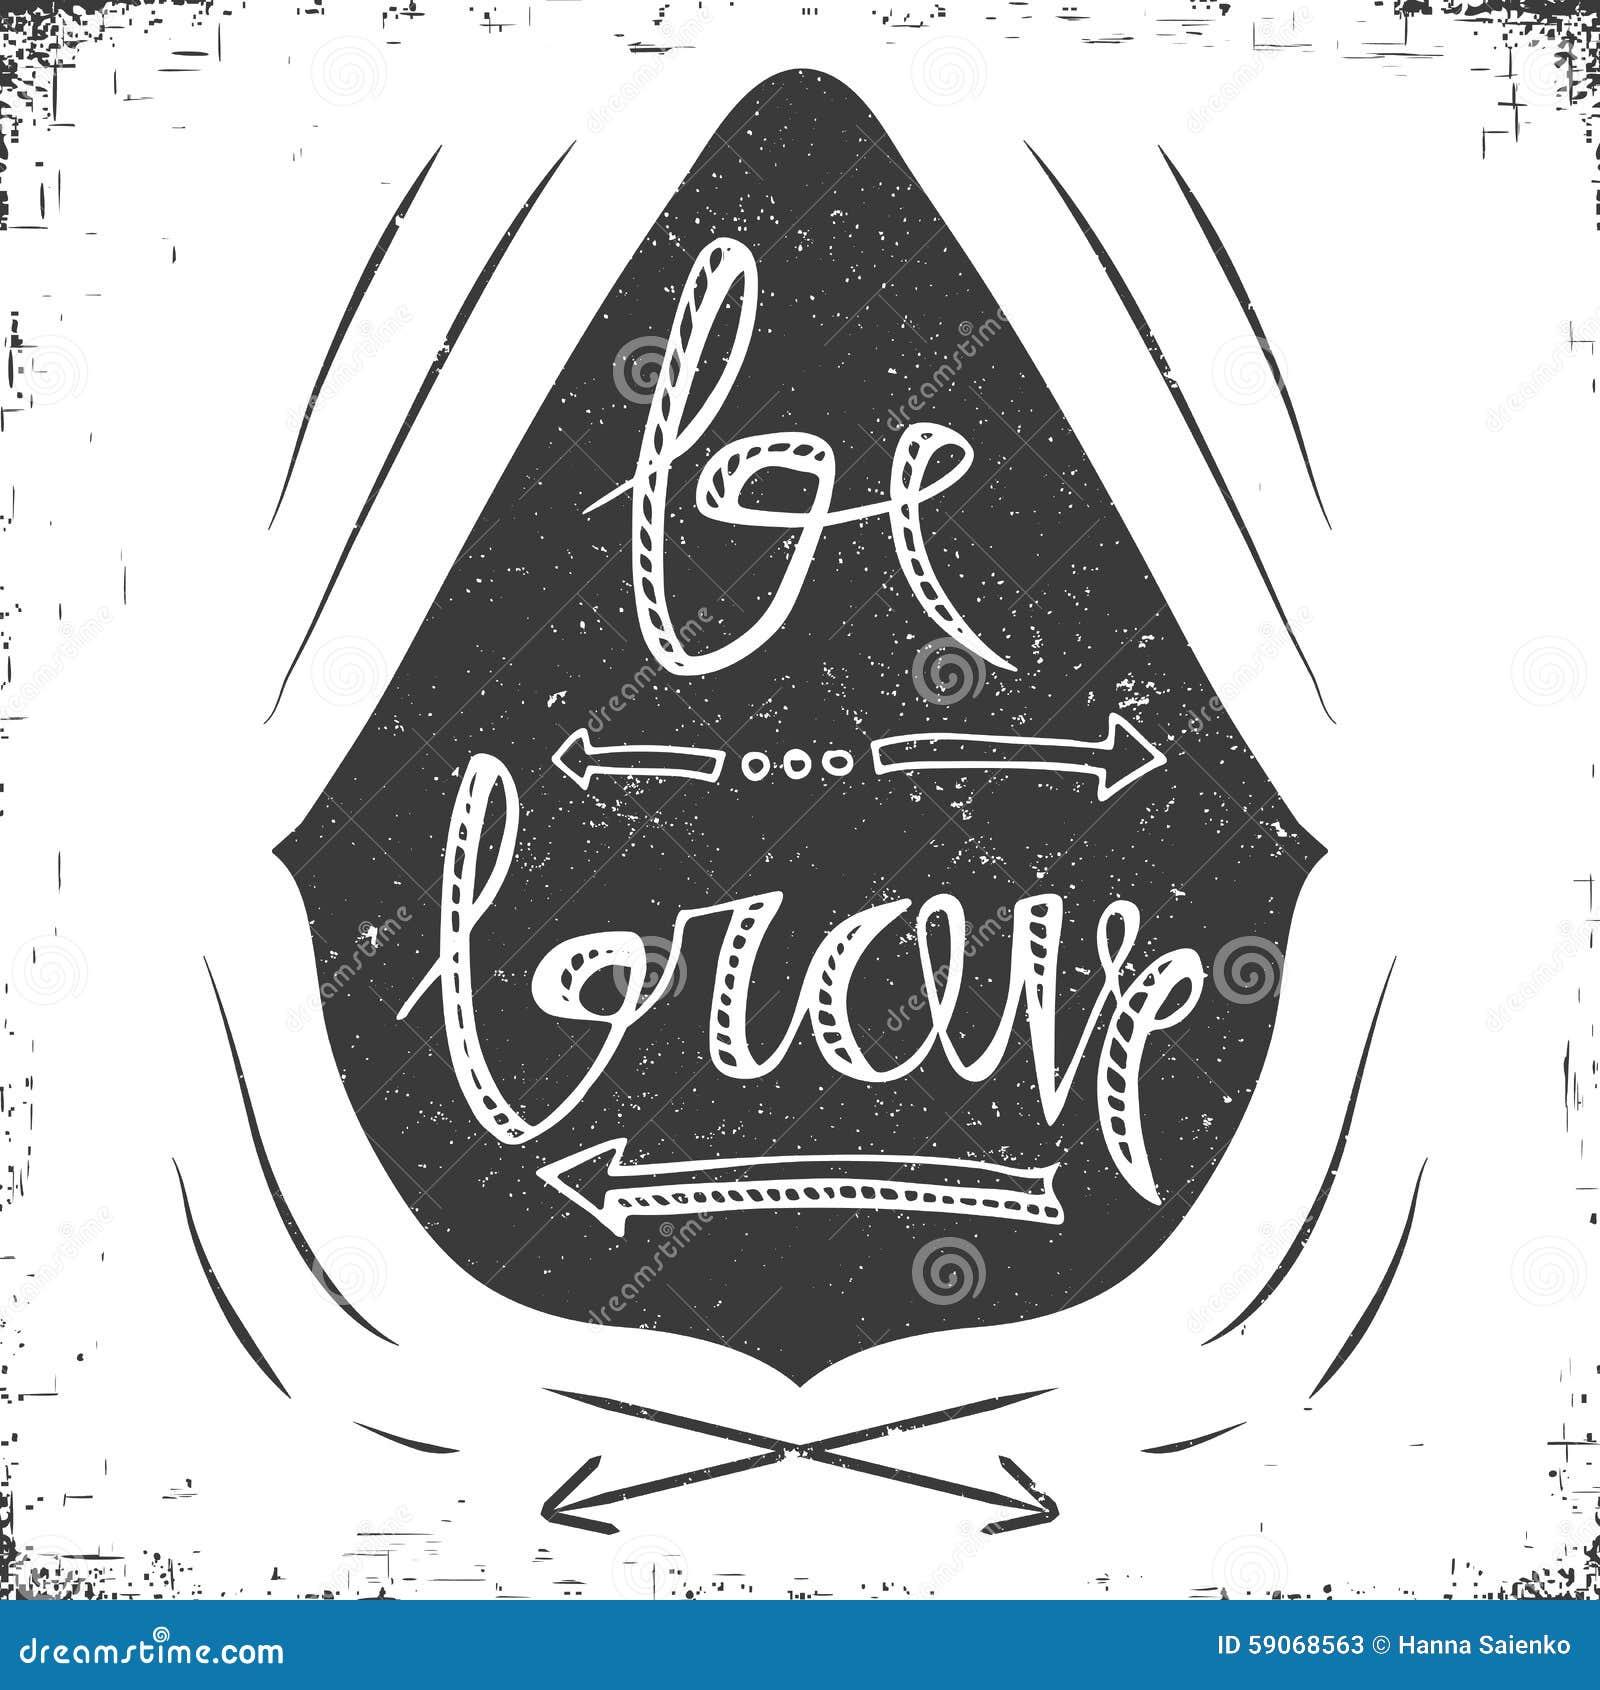 Poster design monochrome - Hand Drawn Typography Poster Stylish Typographic Poster Design With Inscription Be Brave Inspirational Illustration